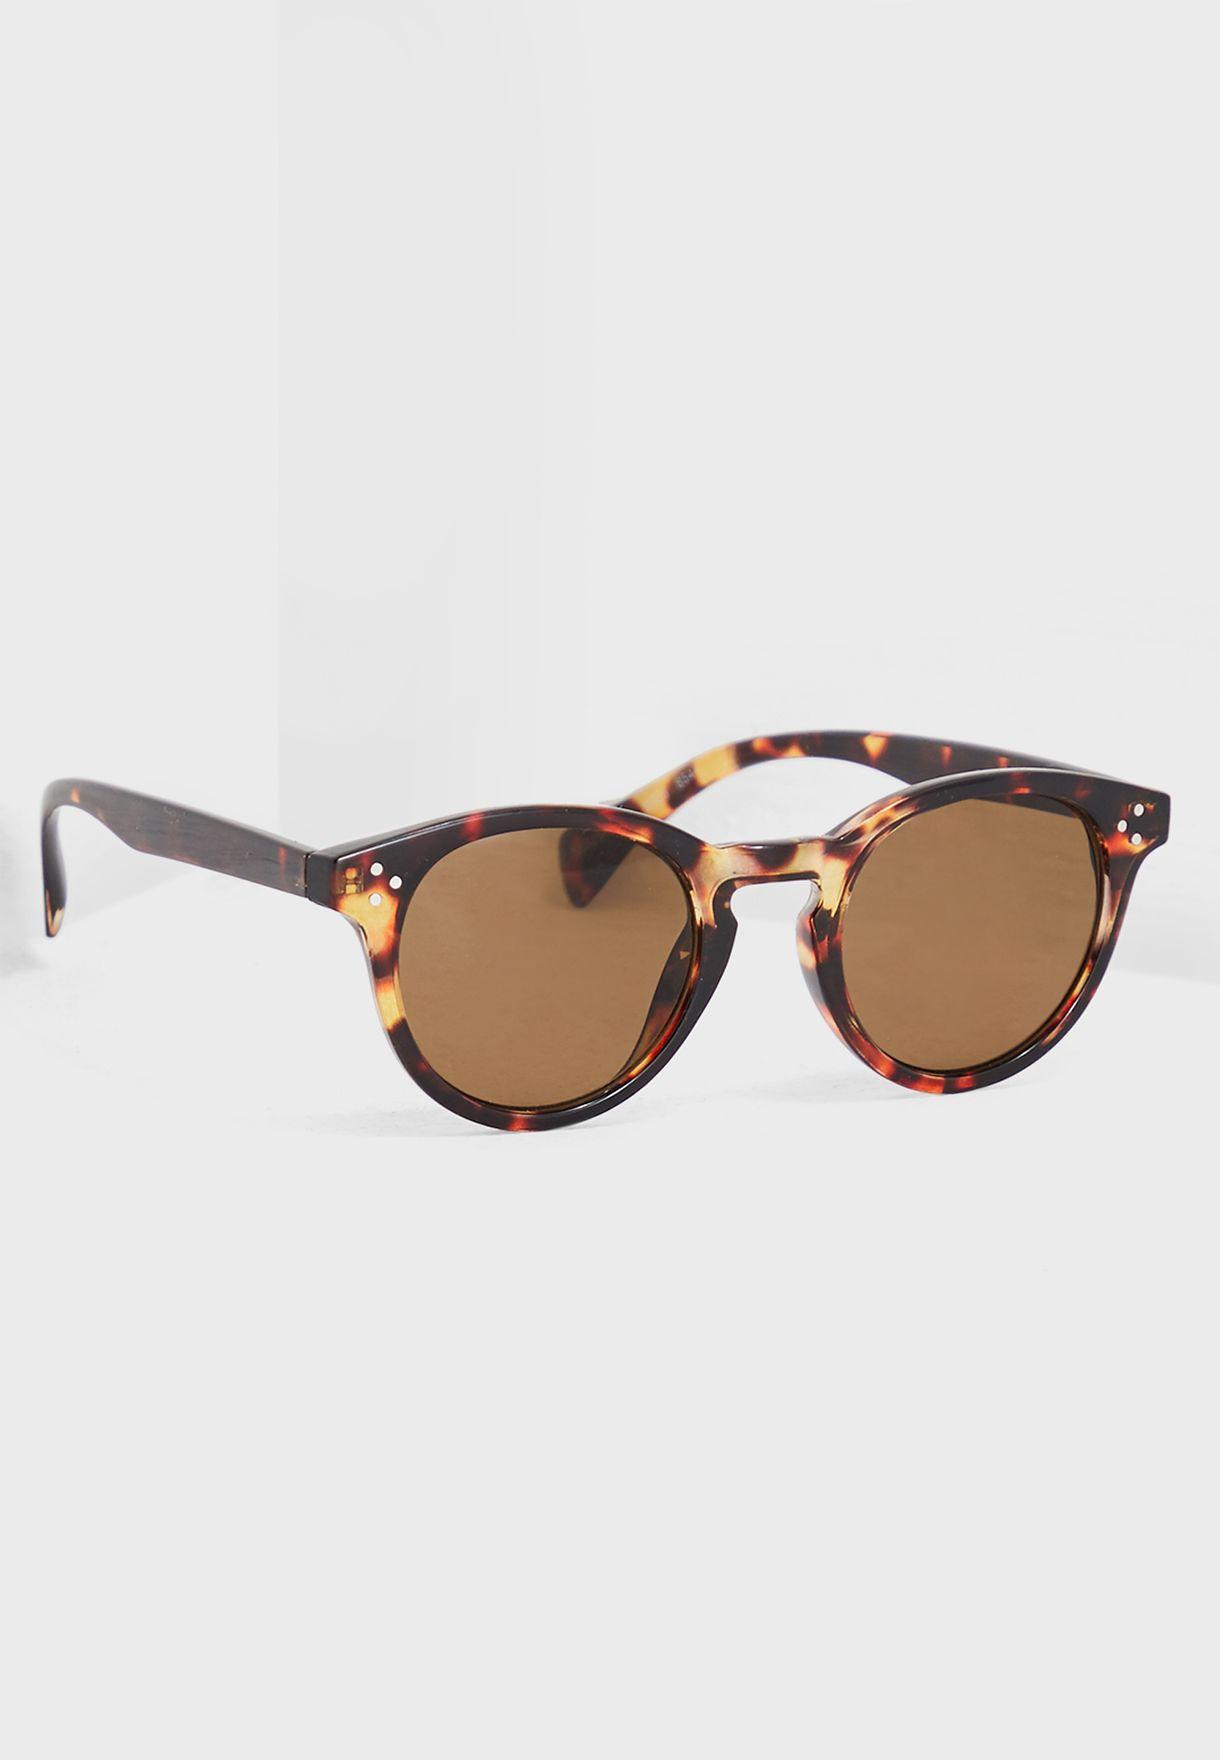 6d676a669717 Shop Topman Brown Tortoiseshell Round Sunglasses 56S29RBRN for Men ...